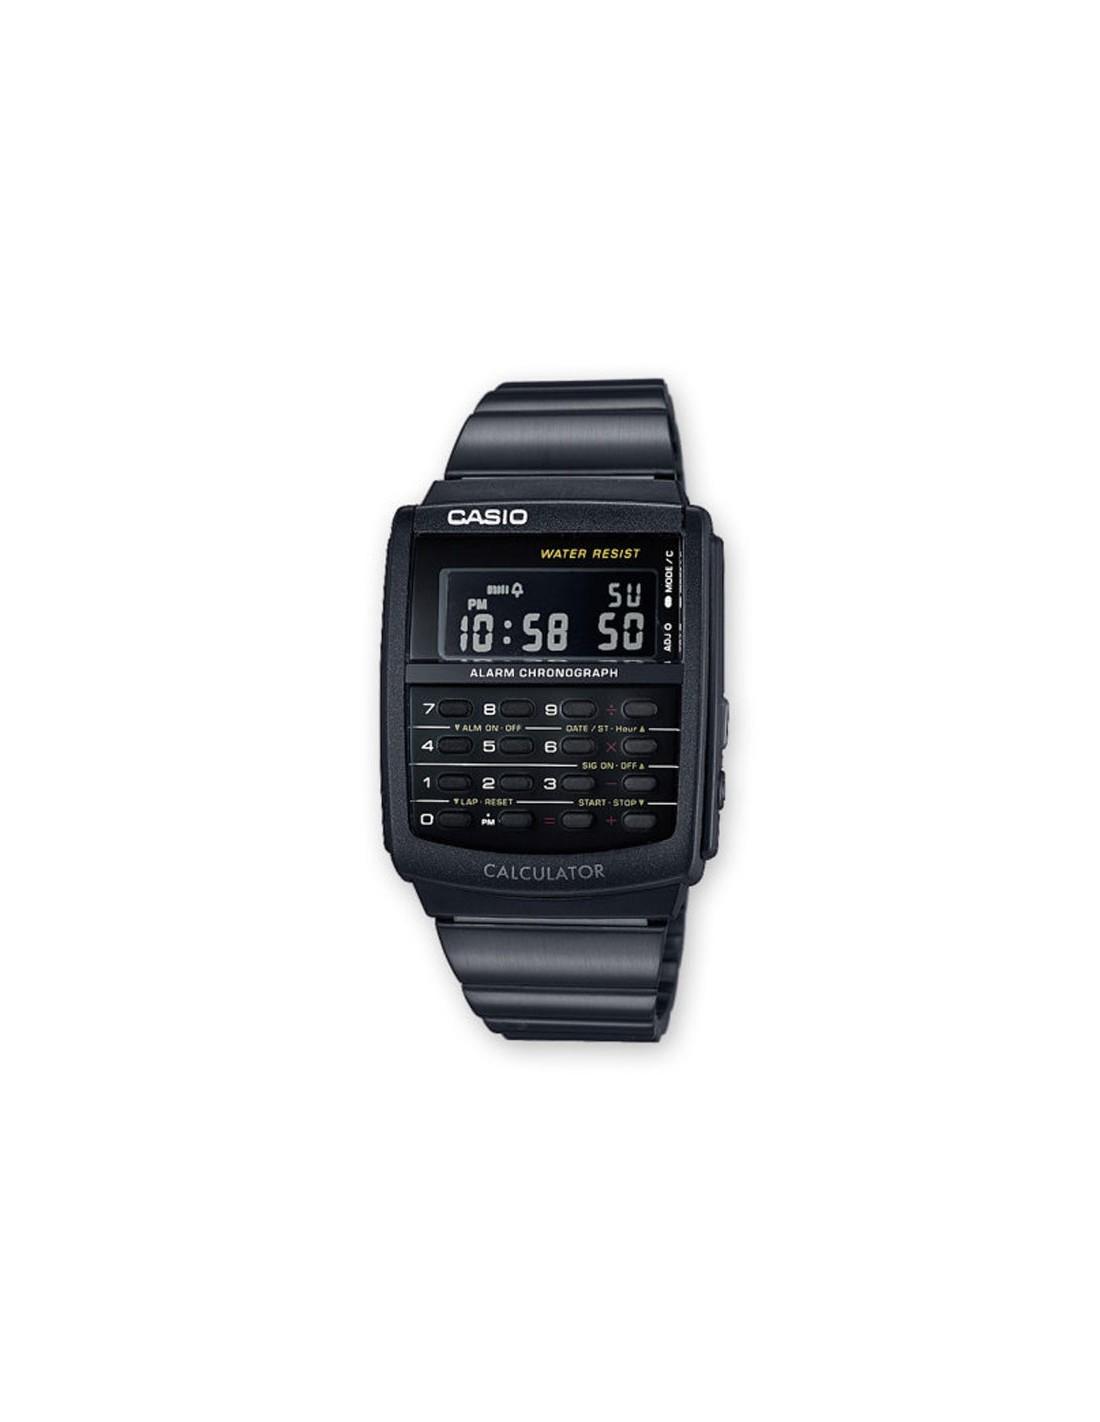 156a535a8a6b Reloj Casio Collection CA-506B-1AEF